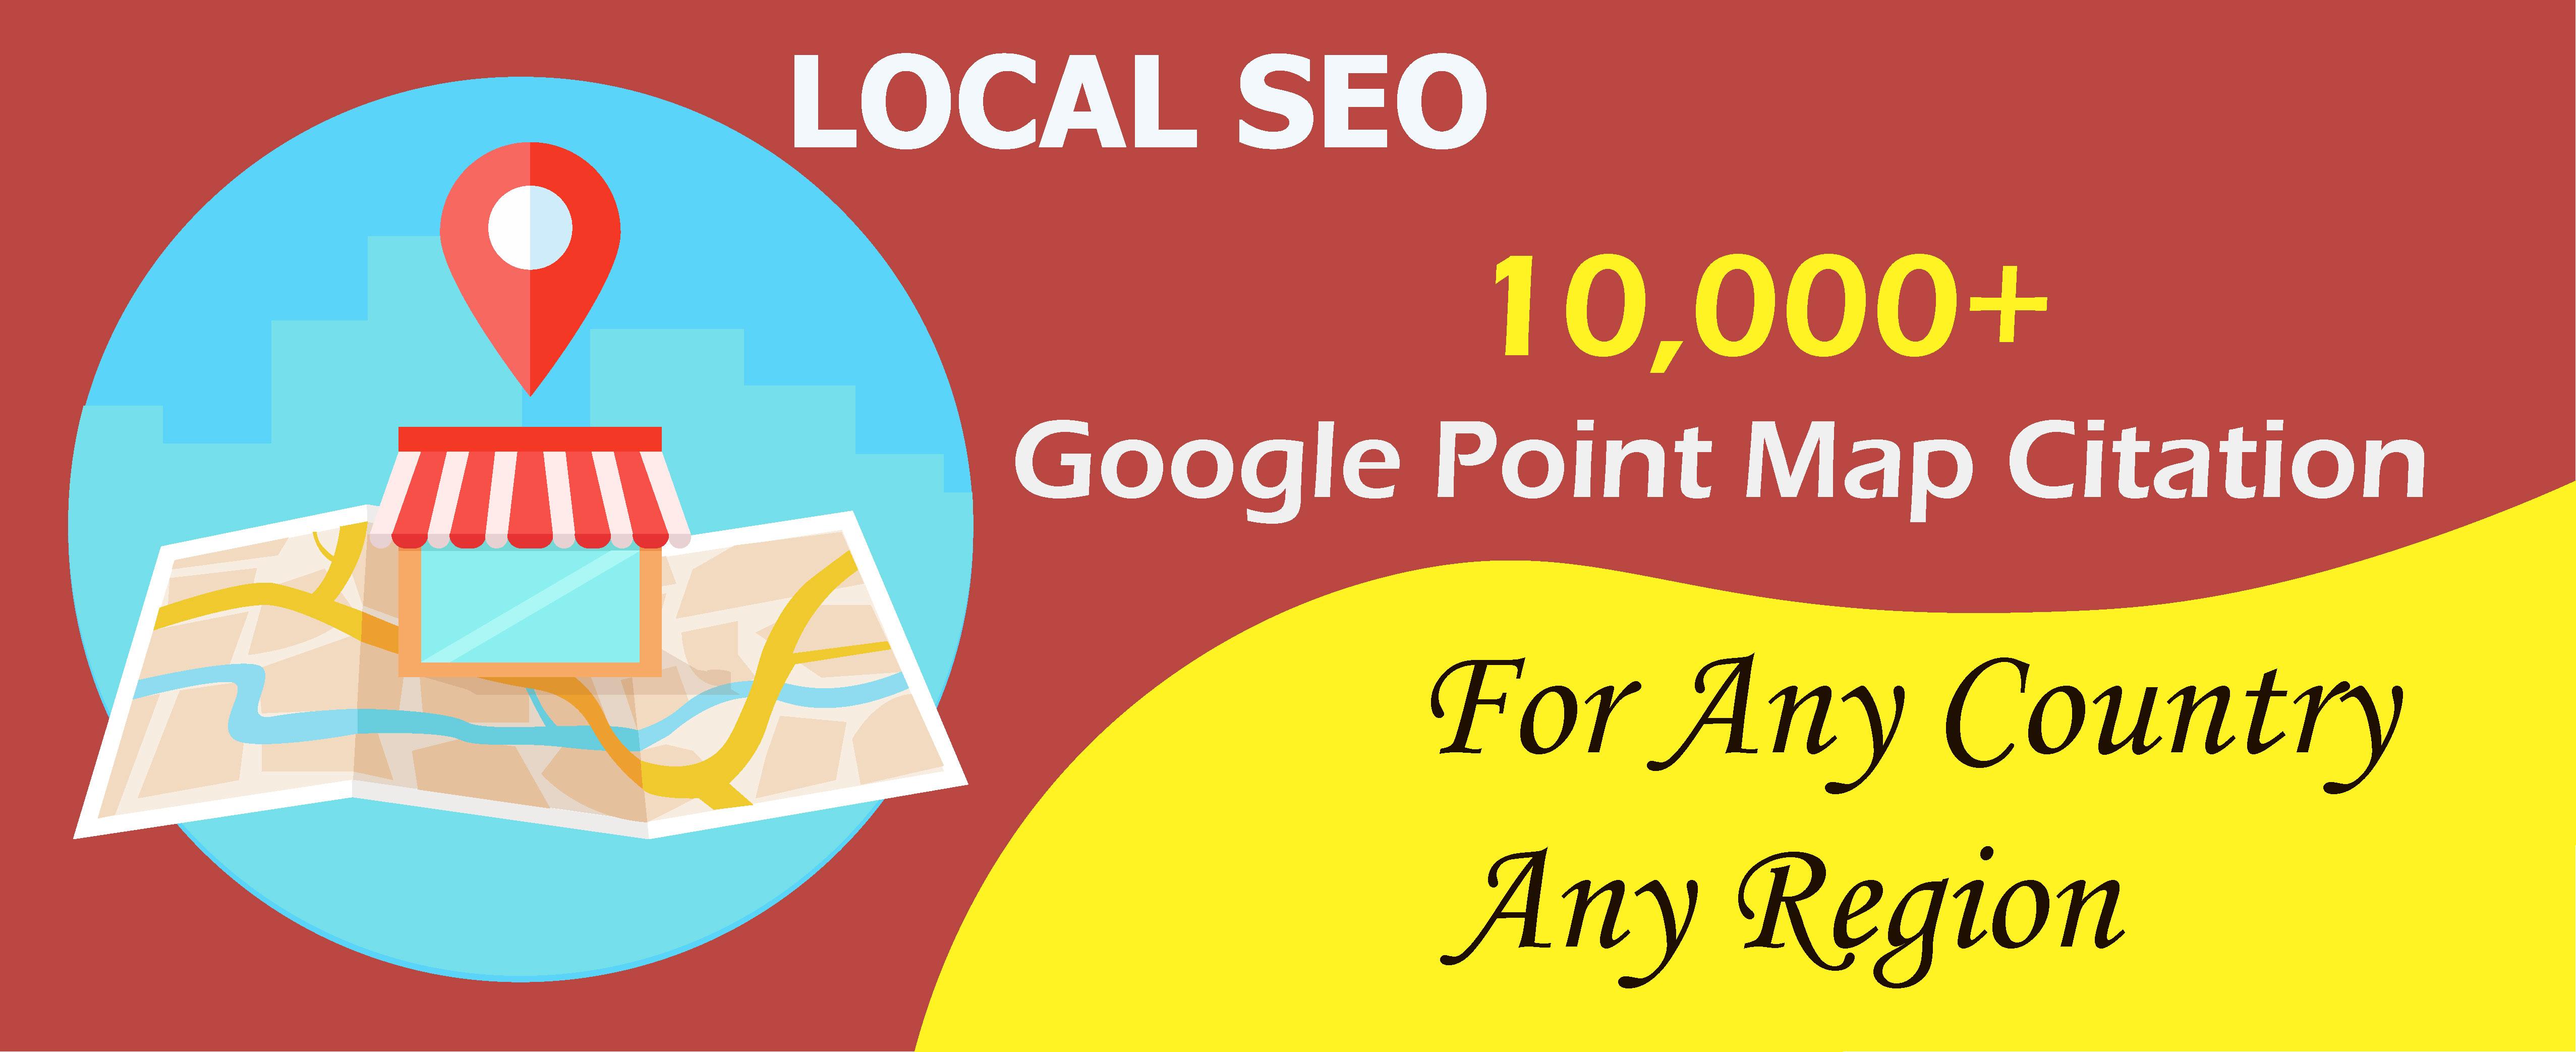 I create google maps citations for local business SEO